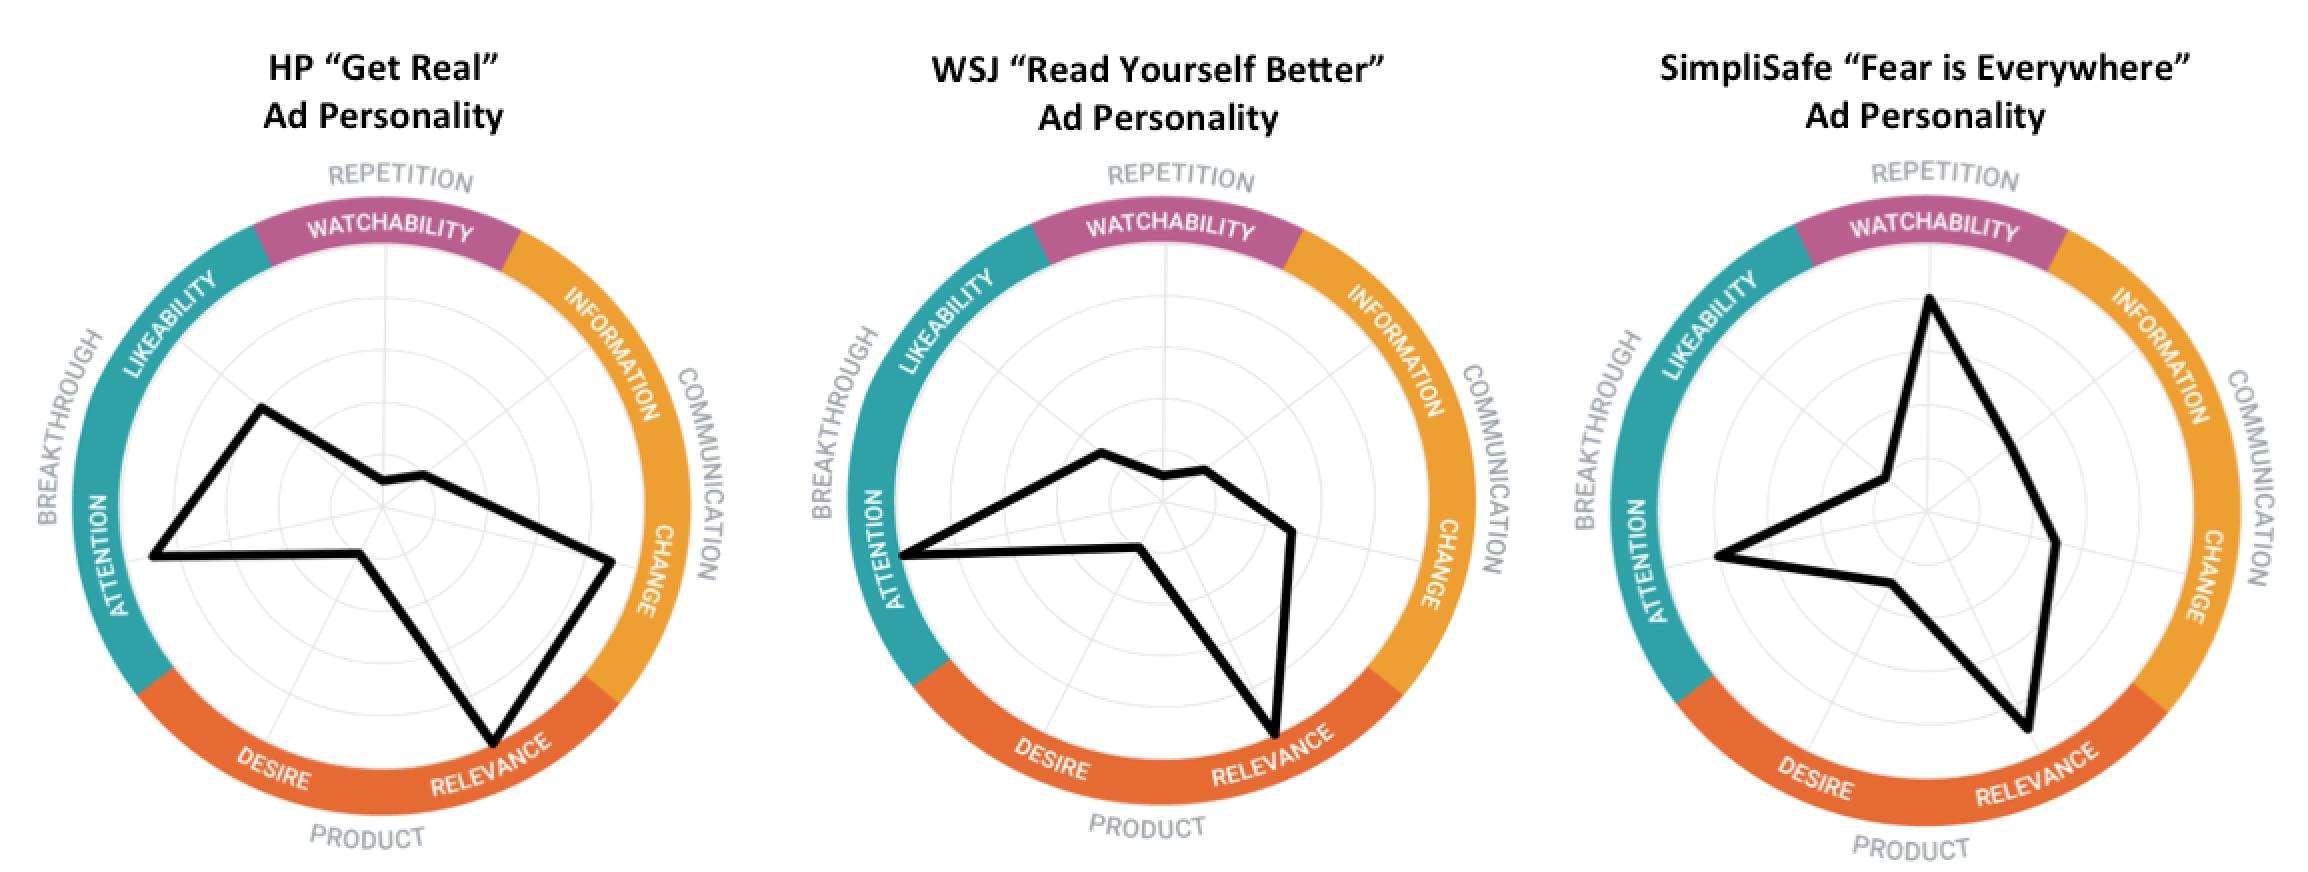 Ad Personalities: HP, WSJ, SimpliSafe